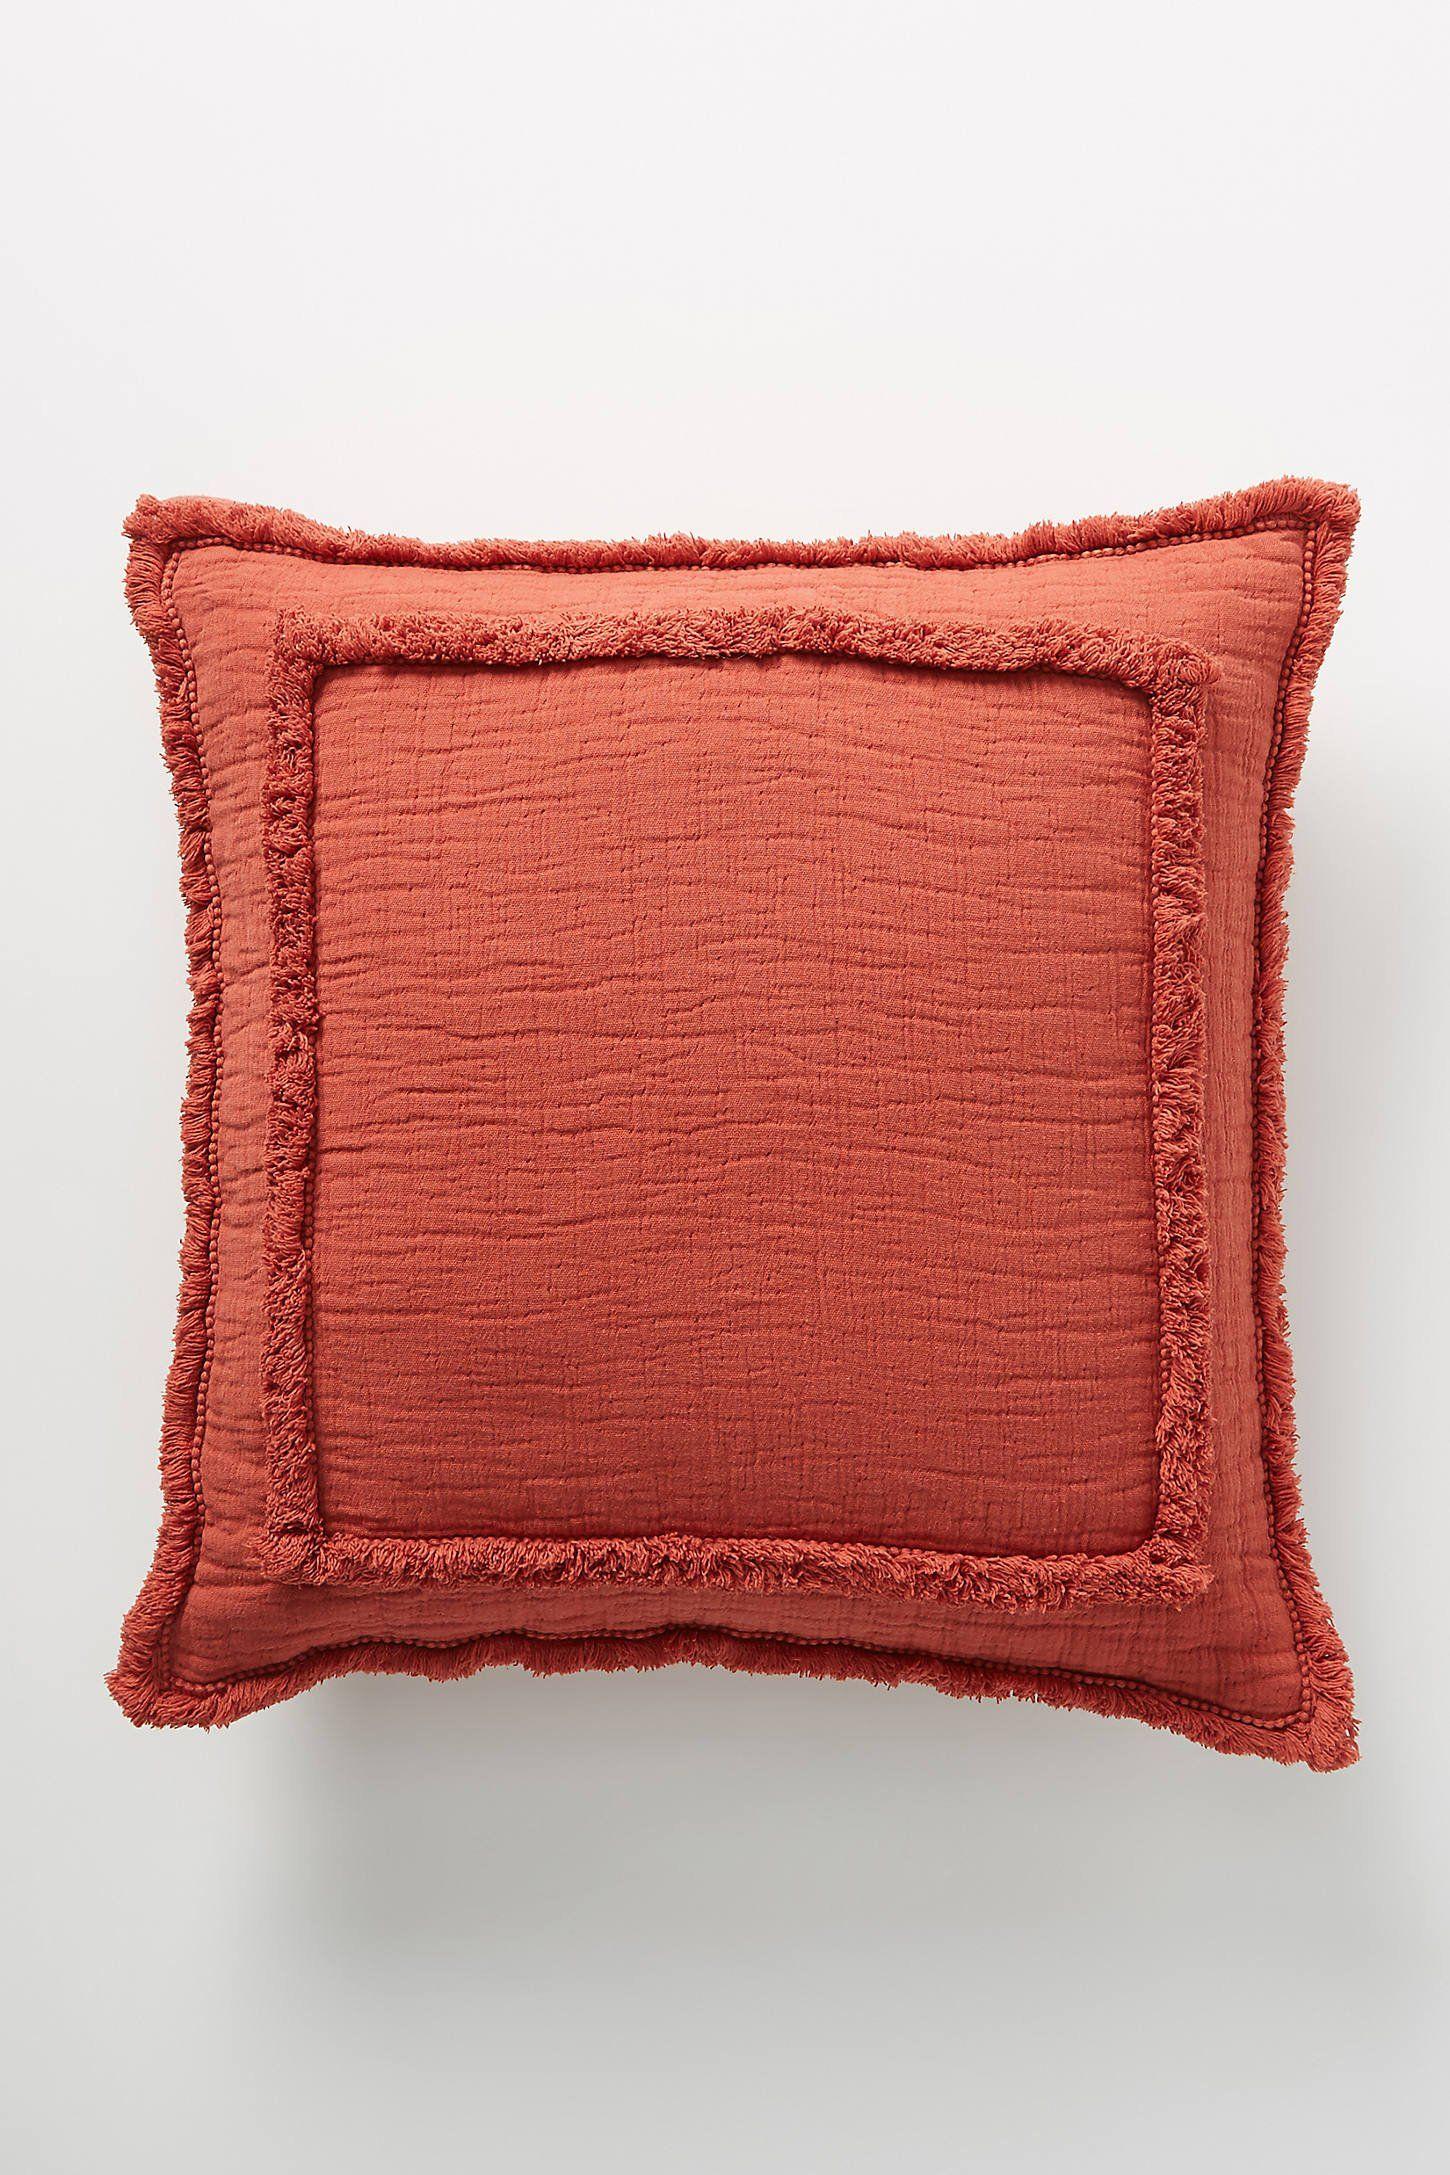 Soho Home x Anthropologie Landyn Pillow